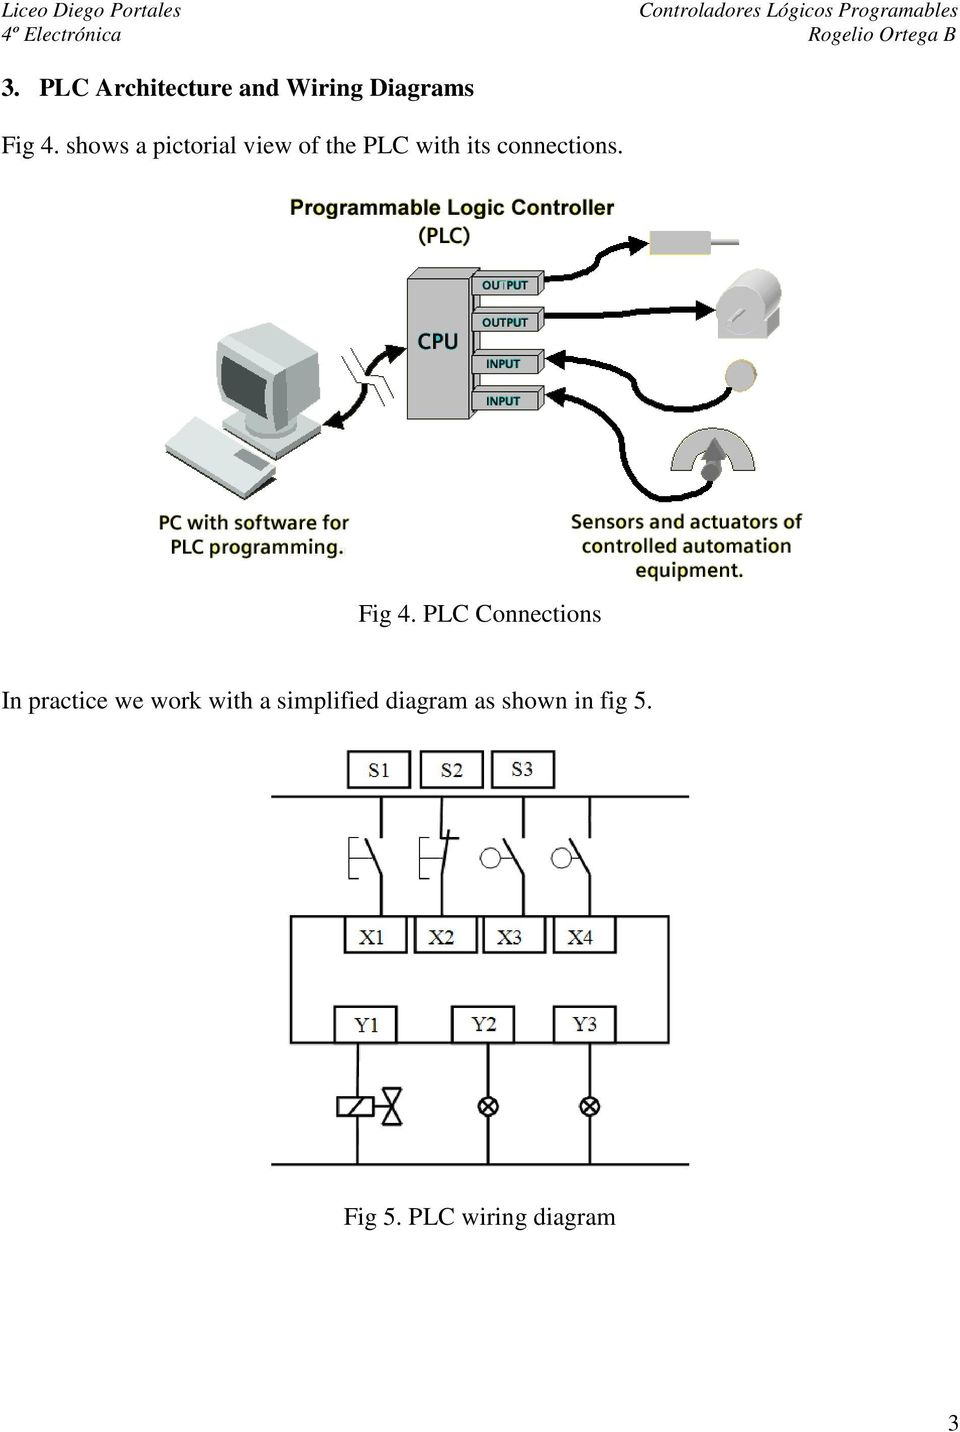 john deere 60 wire schematic wiring diagram John Deere 2150 Wiring Diagram farmtrac 60 ignition switch wiring diagram wiring diagram postdoc] ➤ diagram farmtrac wiring diagrams ebook